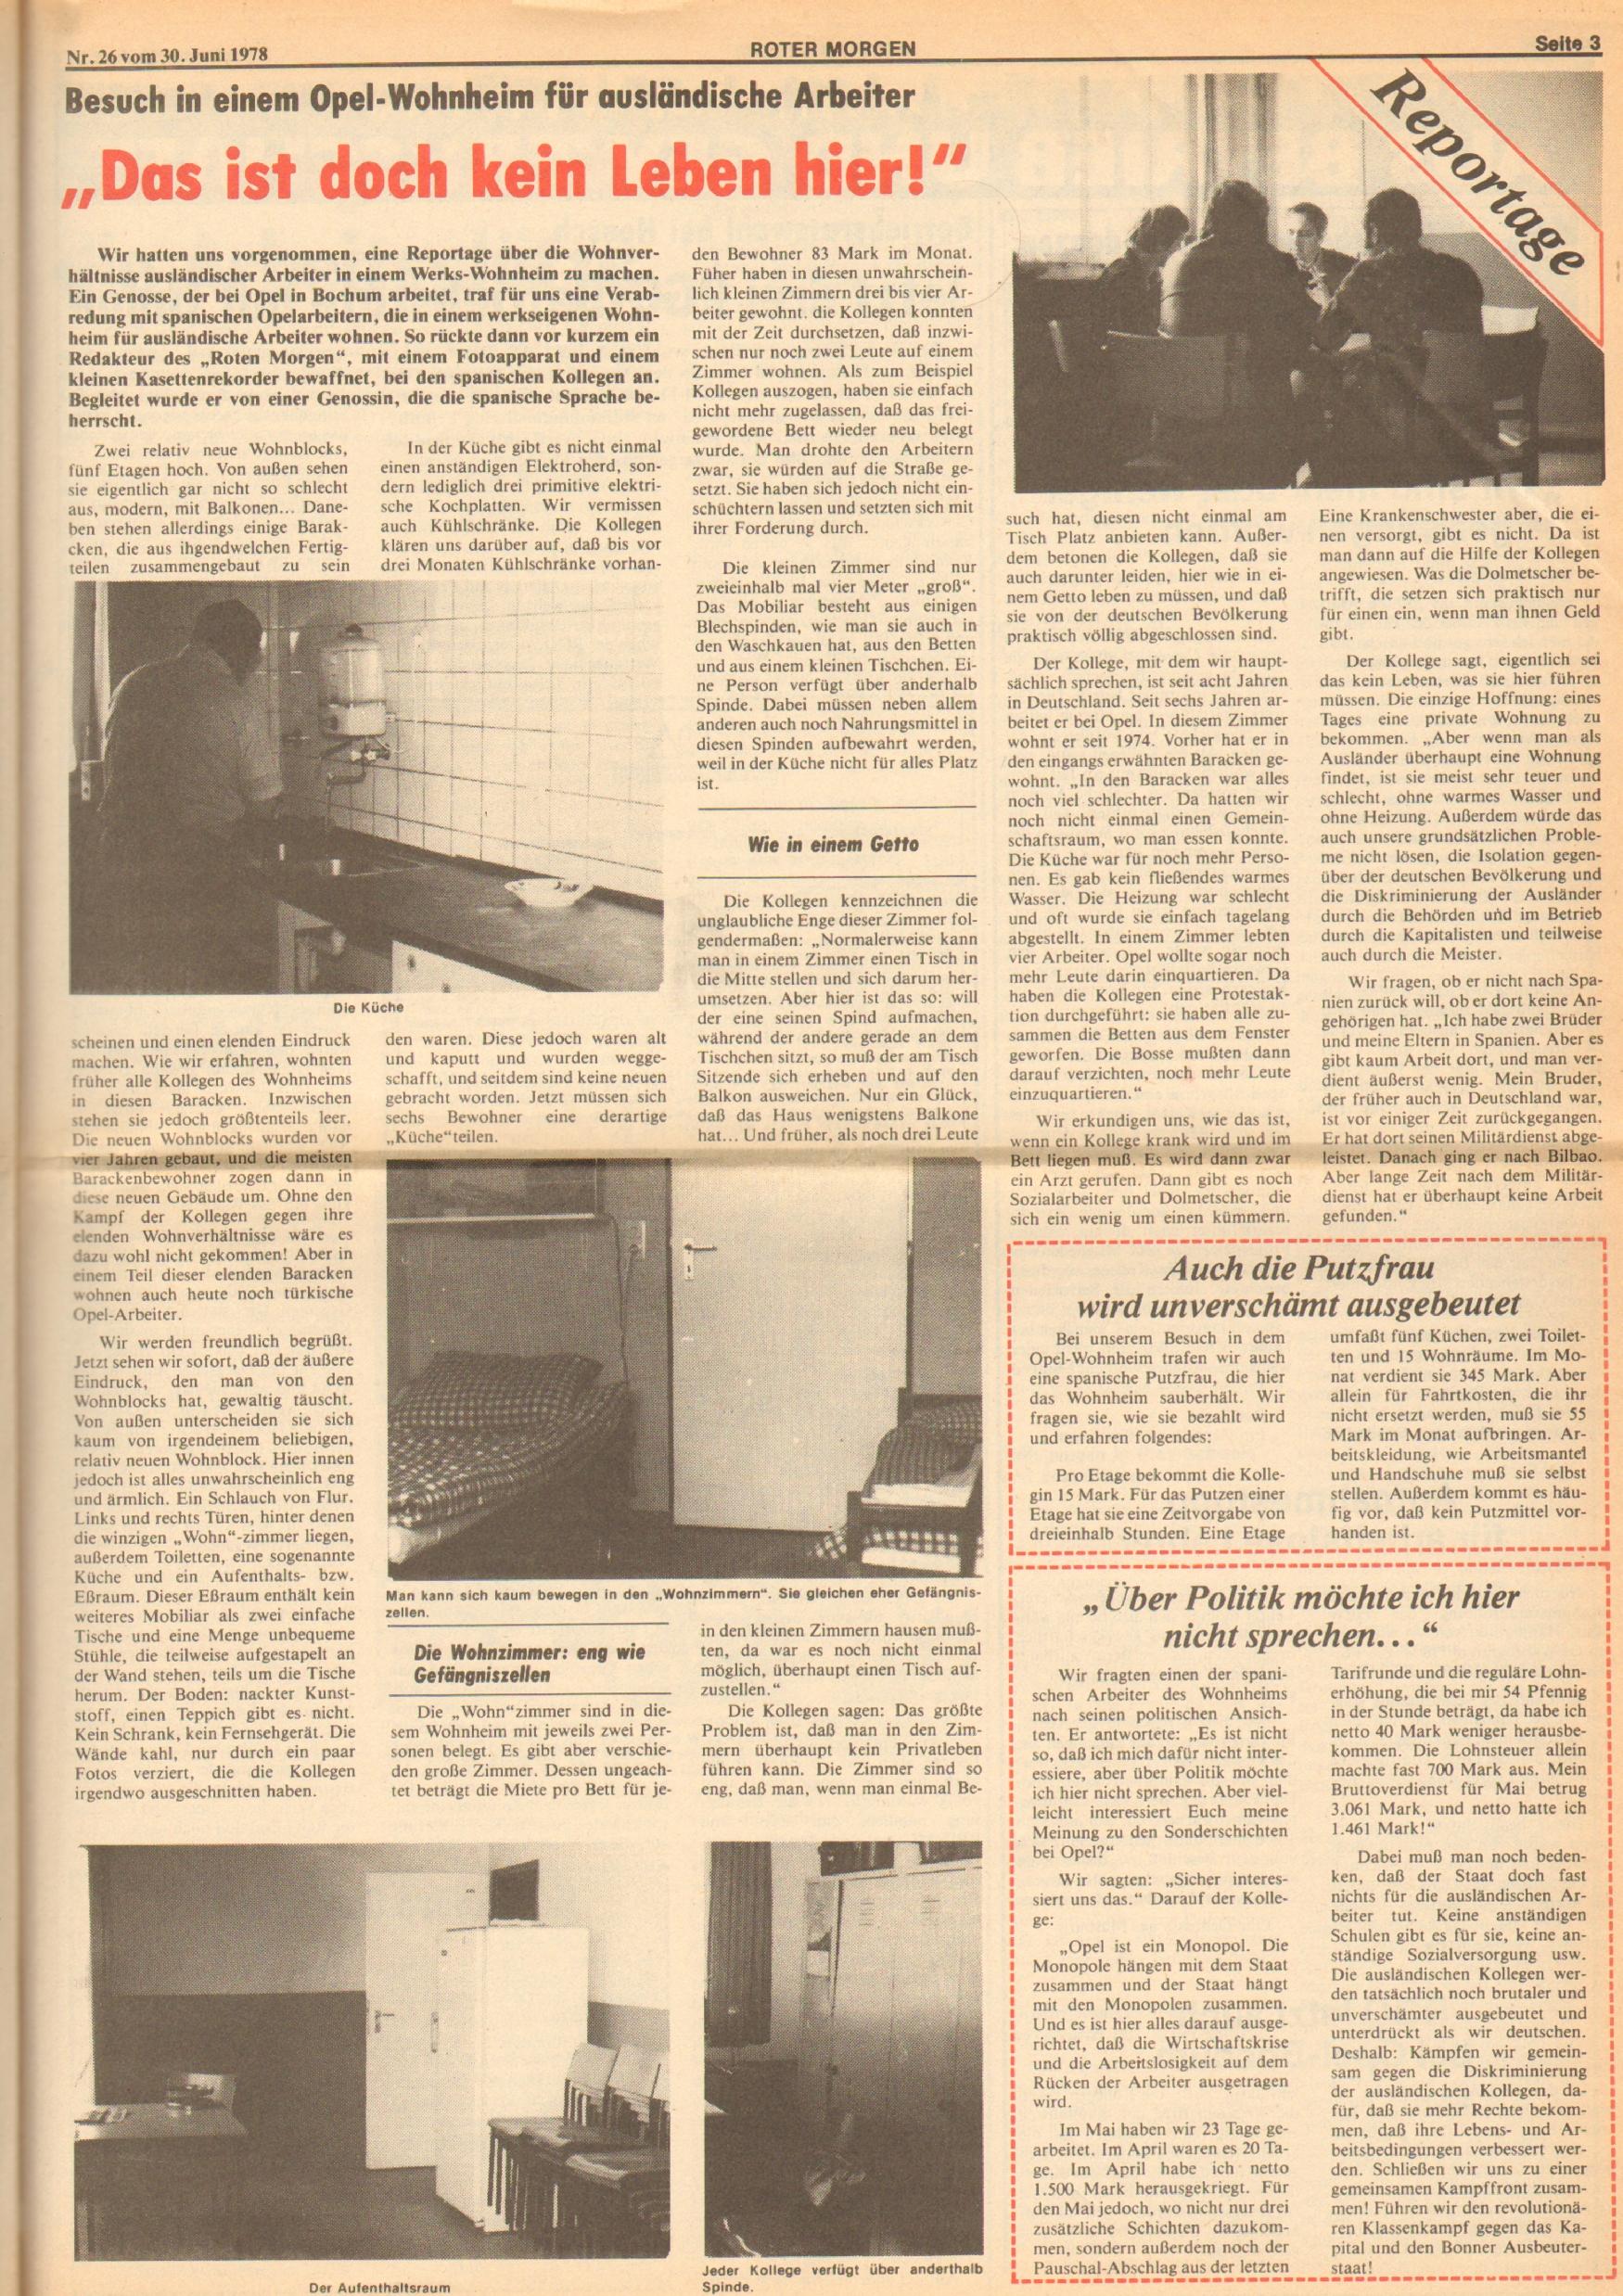 Roter Morgen, 12. Jg., 30. Juni 1978, Nr. 26, Seite 3